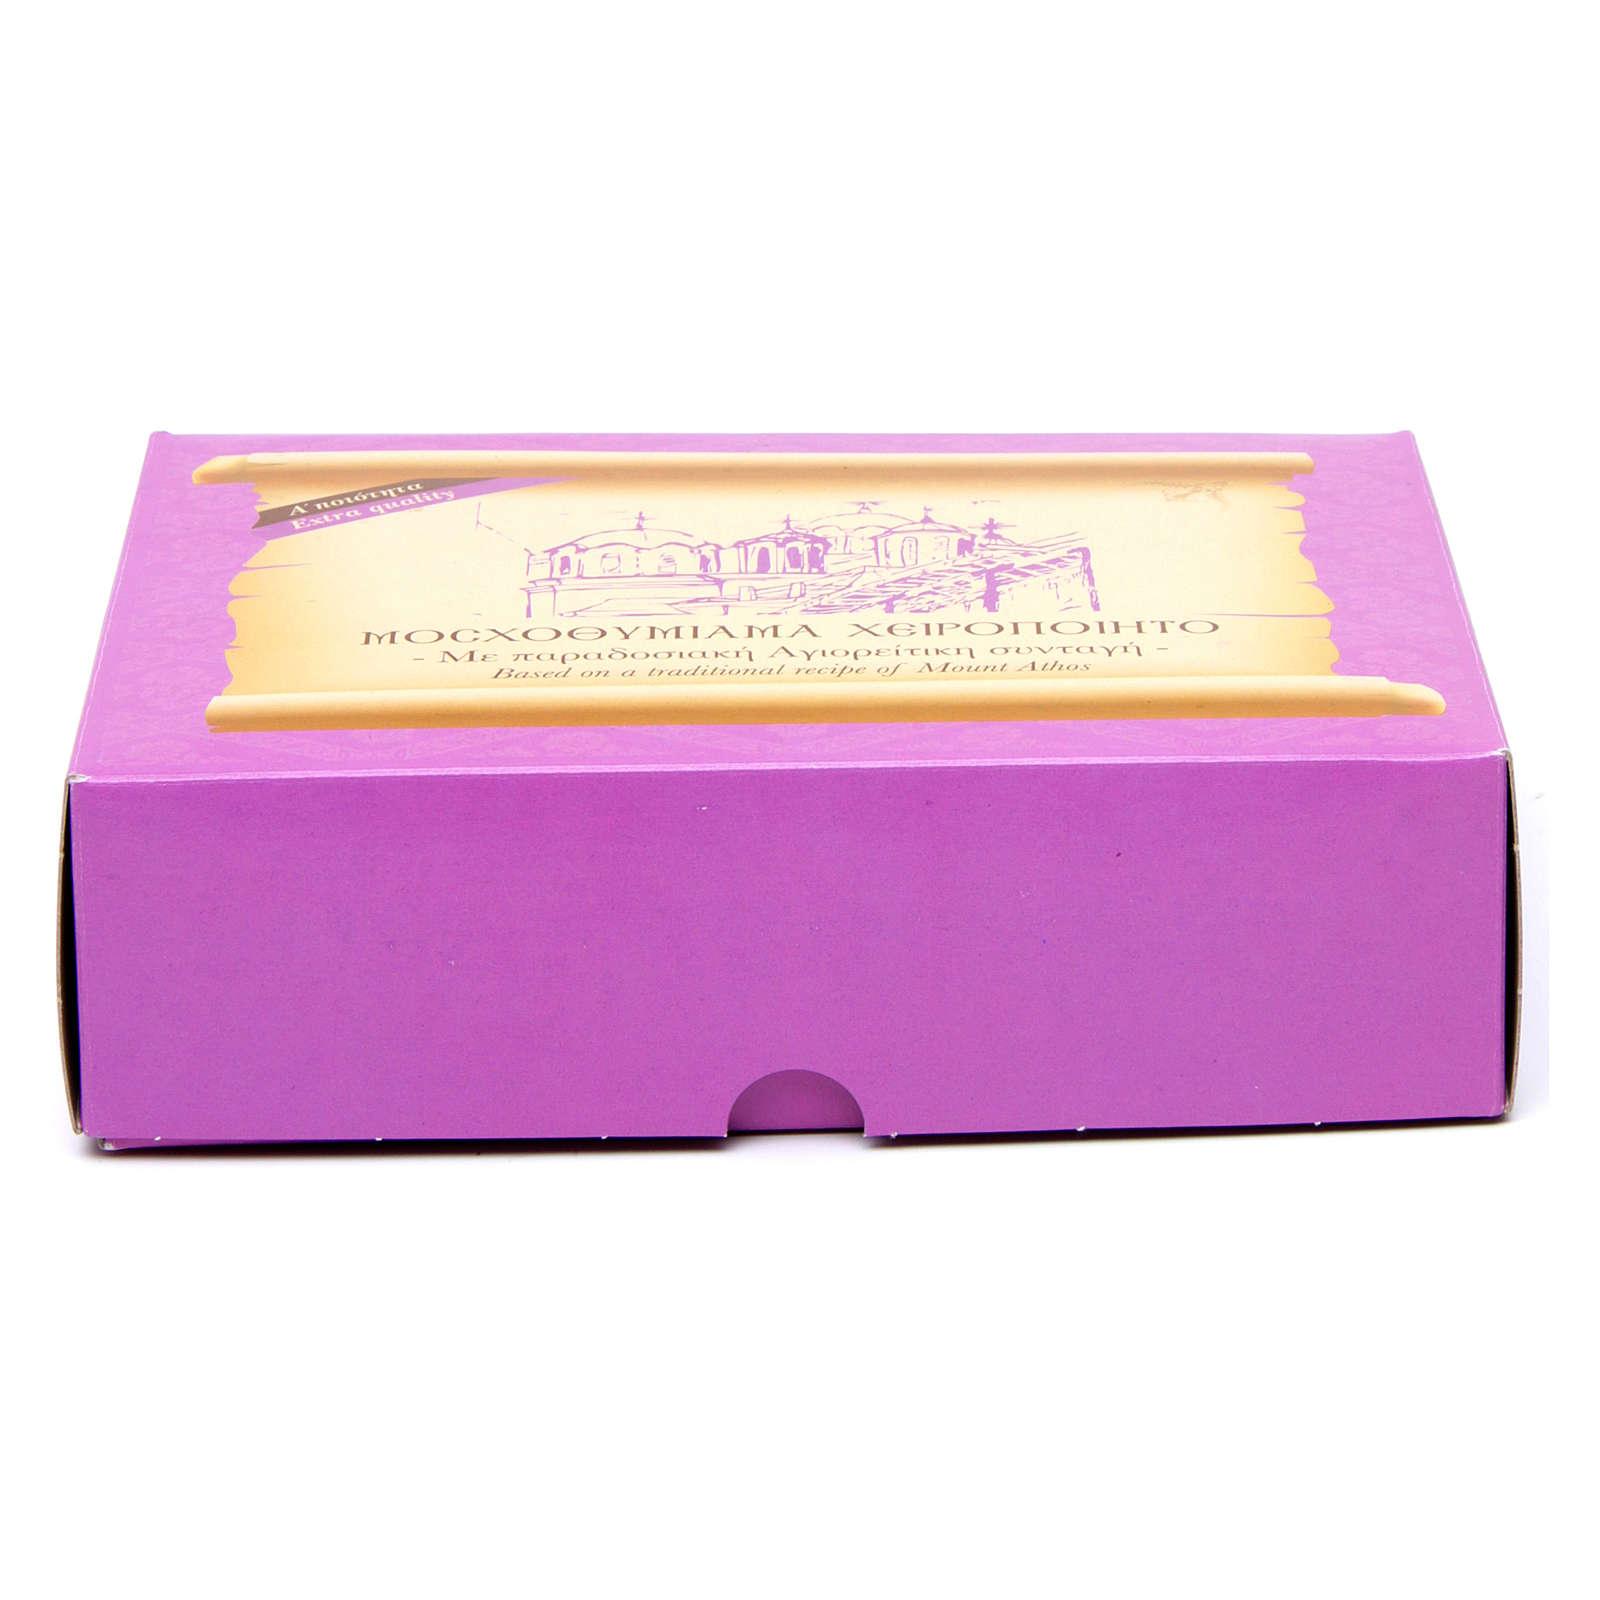 Poppy-scented Greek incense 1 kg 3